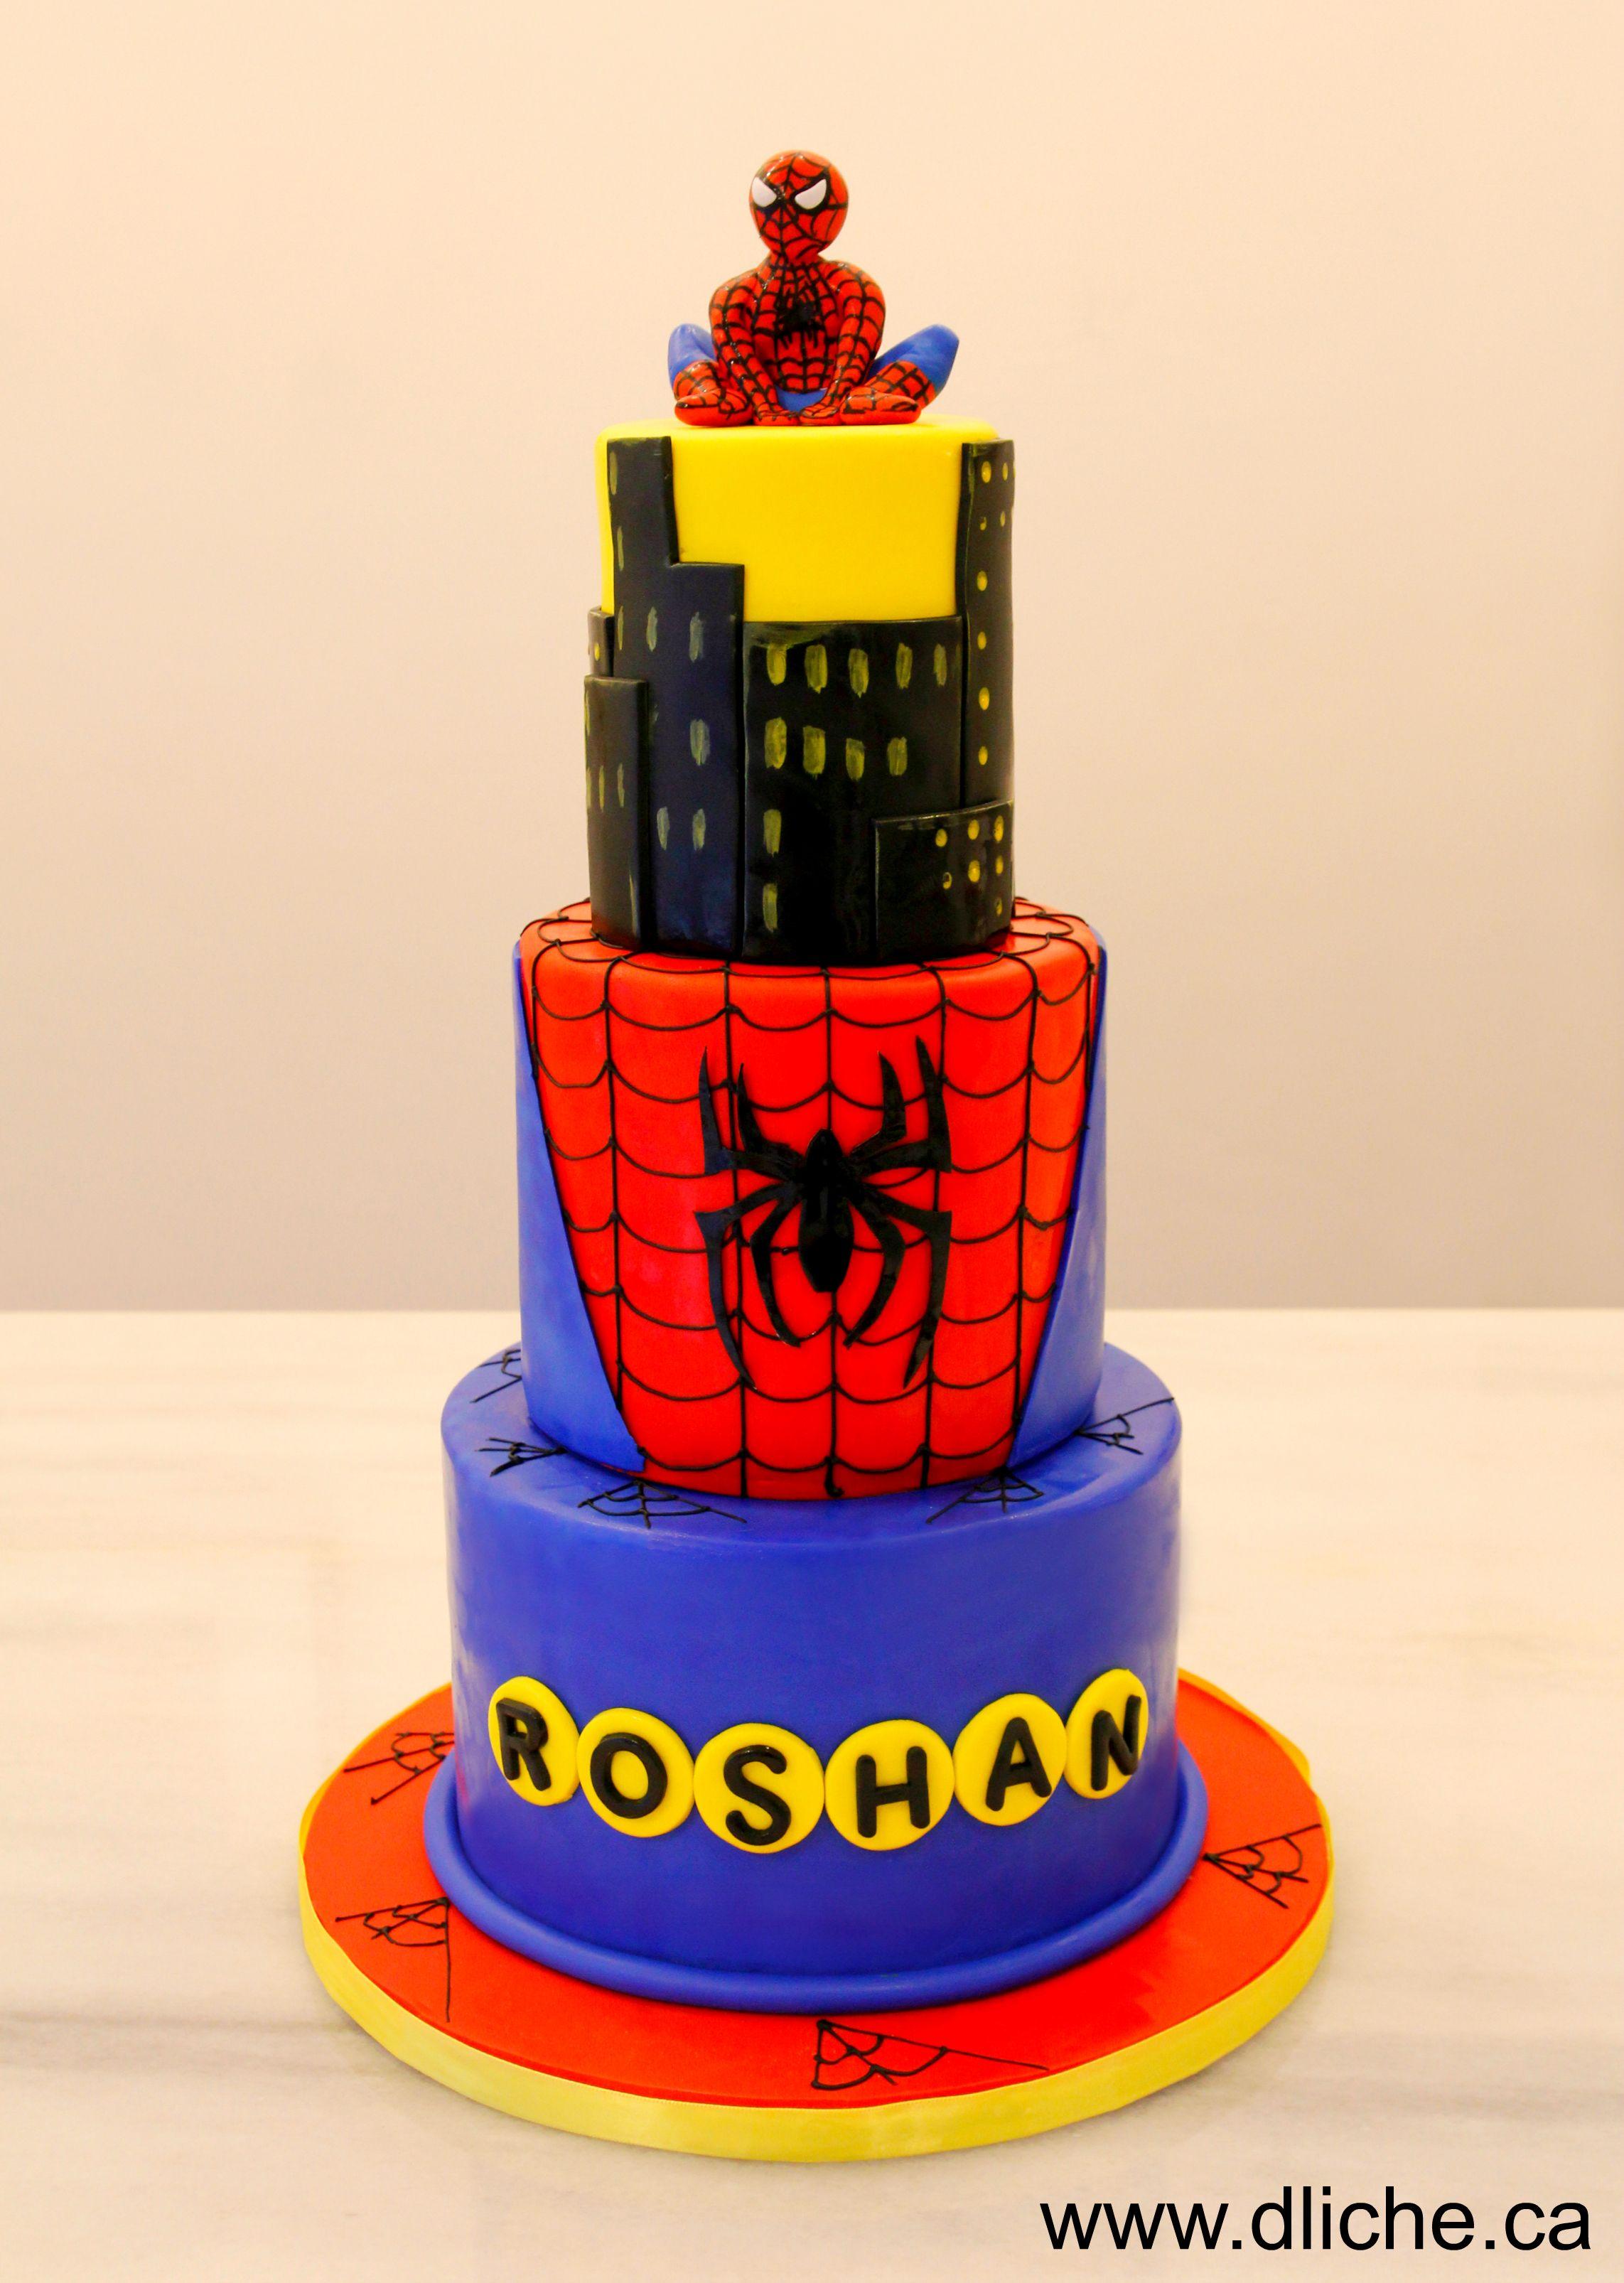 Spiderman surveille la ville ainsi que le gâteau!  Spiderman looks over the city and this cake!